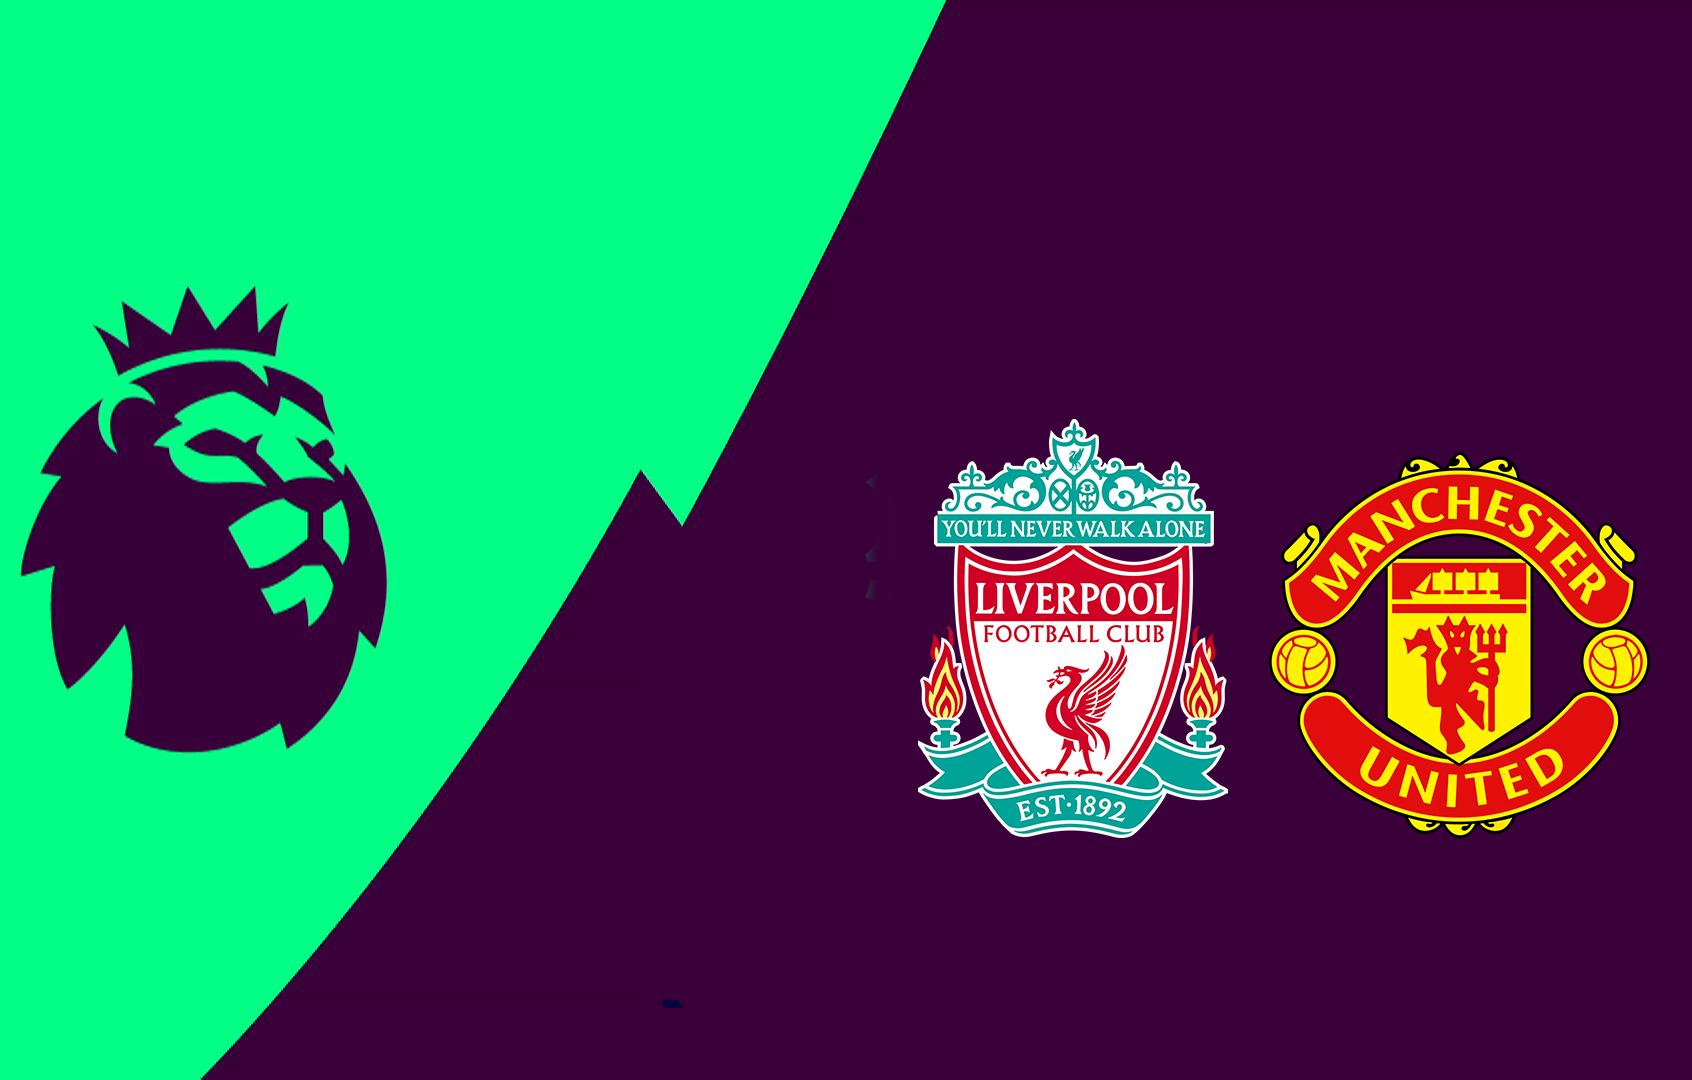 soi-keo-ca-cuoc-bong-da-ngay-19-1-liverpool-vs-manchester-united-bat-luc-o-anfield-b9 1